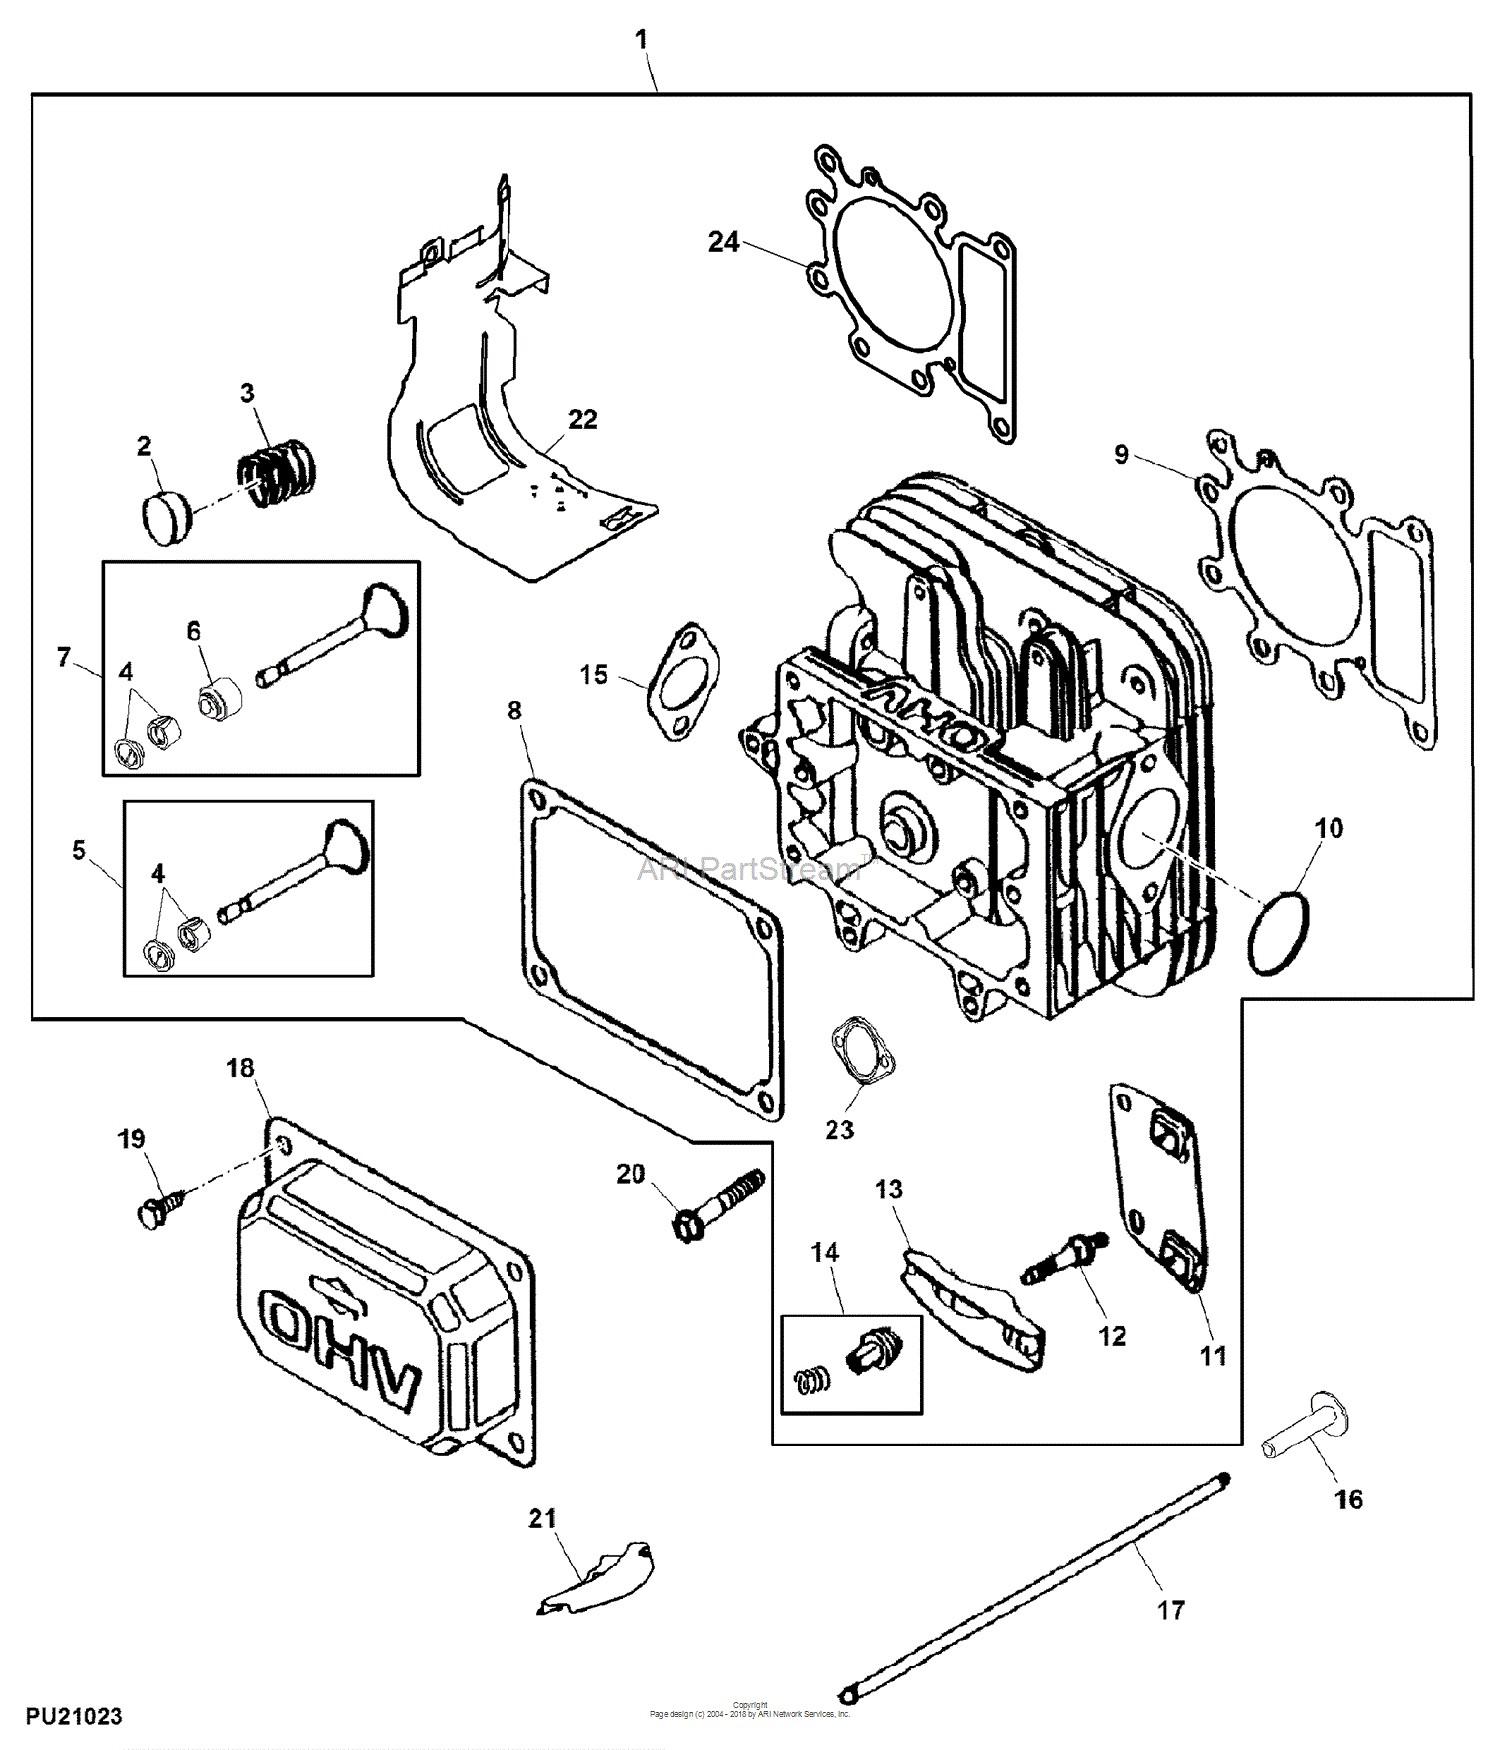 Tractor engine diagram john deere parts diagrams john deere d105